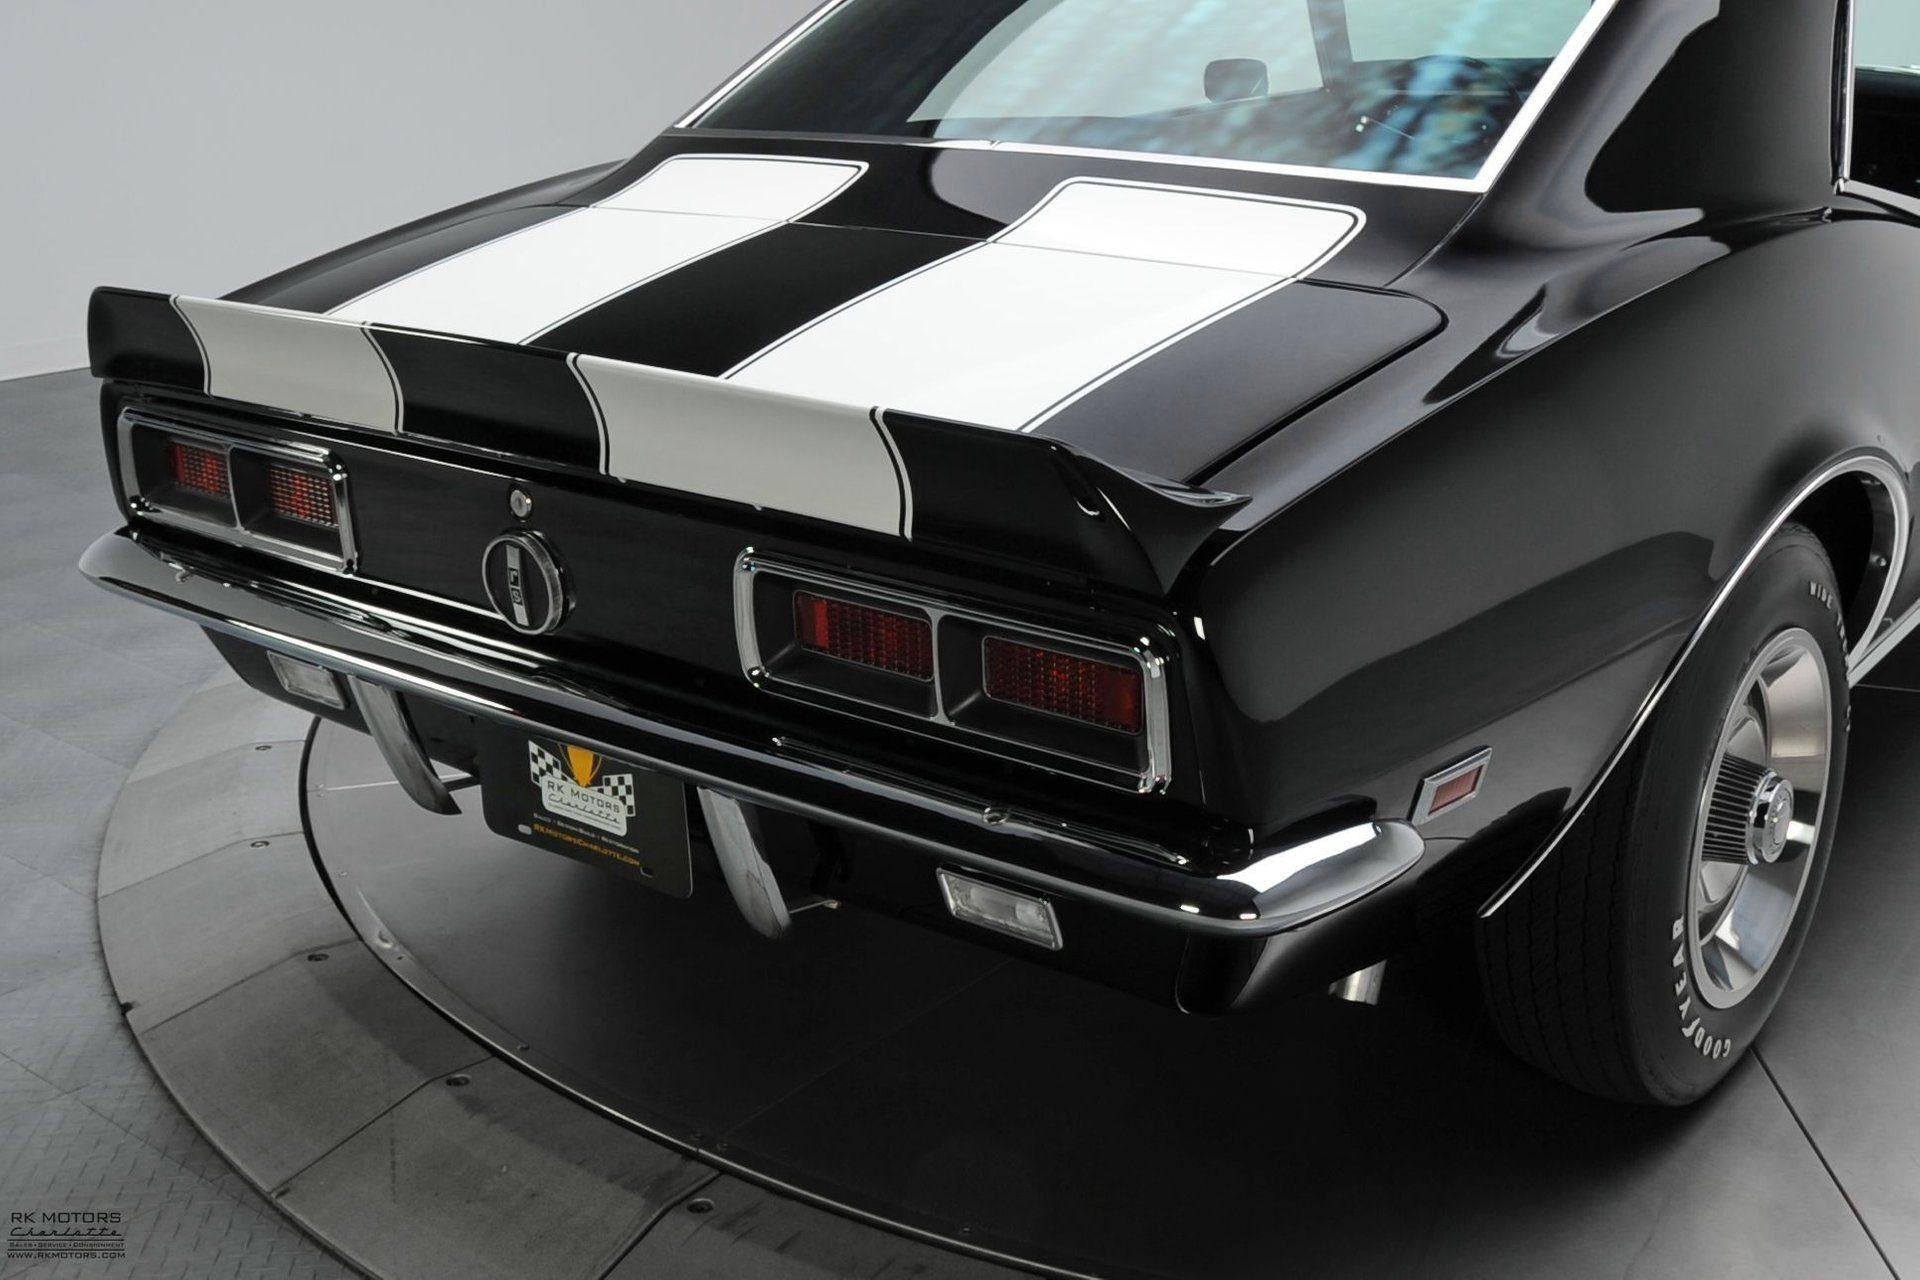 134115 1968 chevrolet camaro rk motors classic cars and